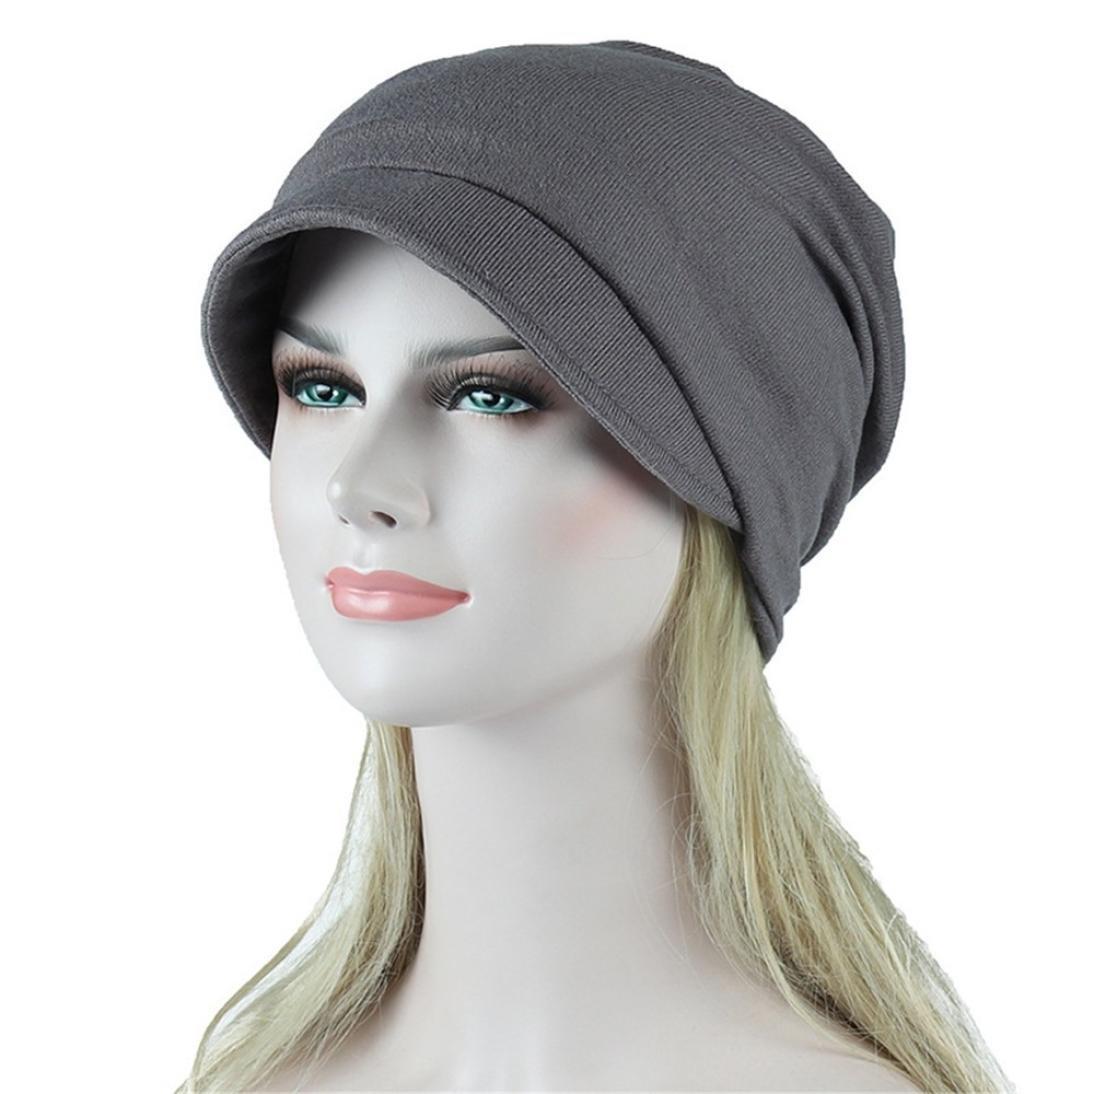 7557df96494 Amazon.com  SUKEQ Womens Slouchy Turban Chemo Hat Cotton Beanie Visor Cap  Cancer Head Scarf Tennis Sun Hat (Black)  Home Improvement